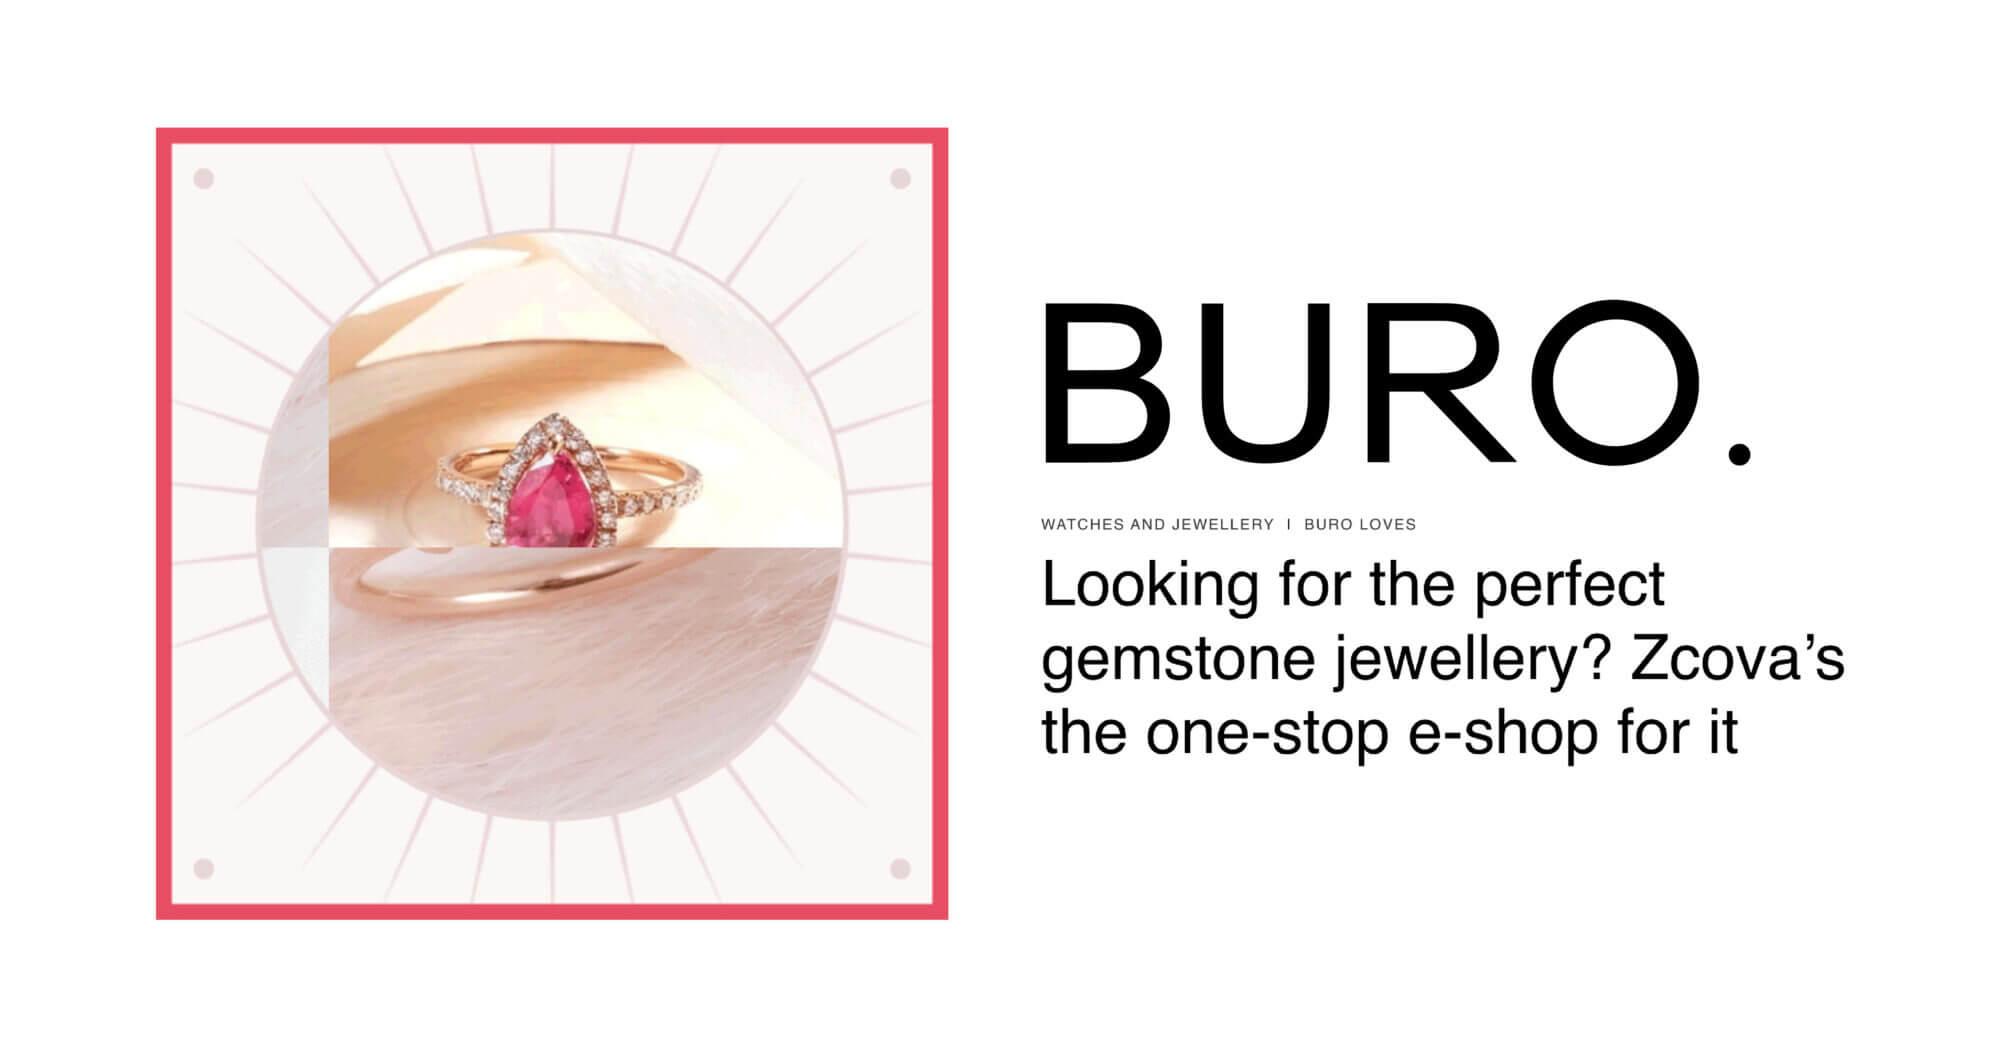 BURO X ZCOVA Gemstone blog cover